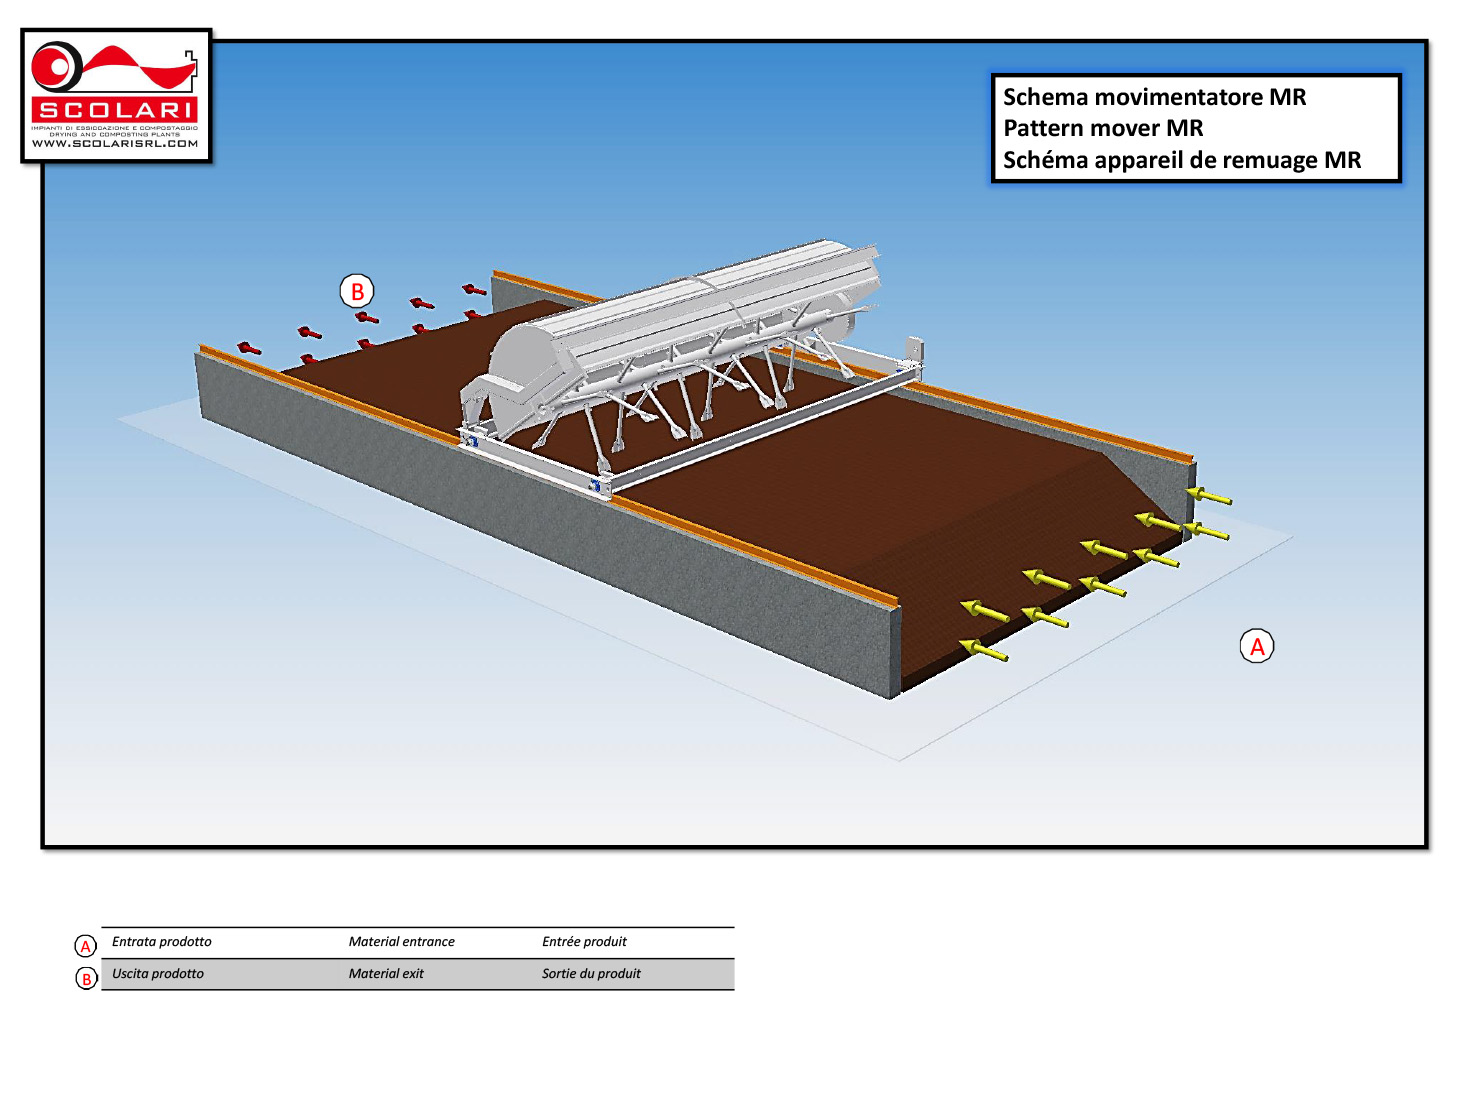 biotunnel-composting-plants-manufacturers